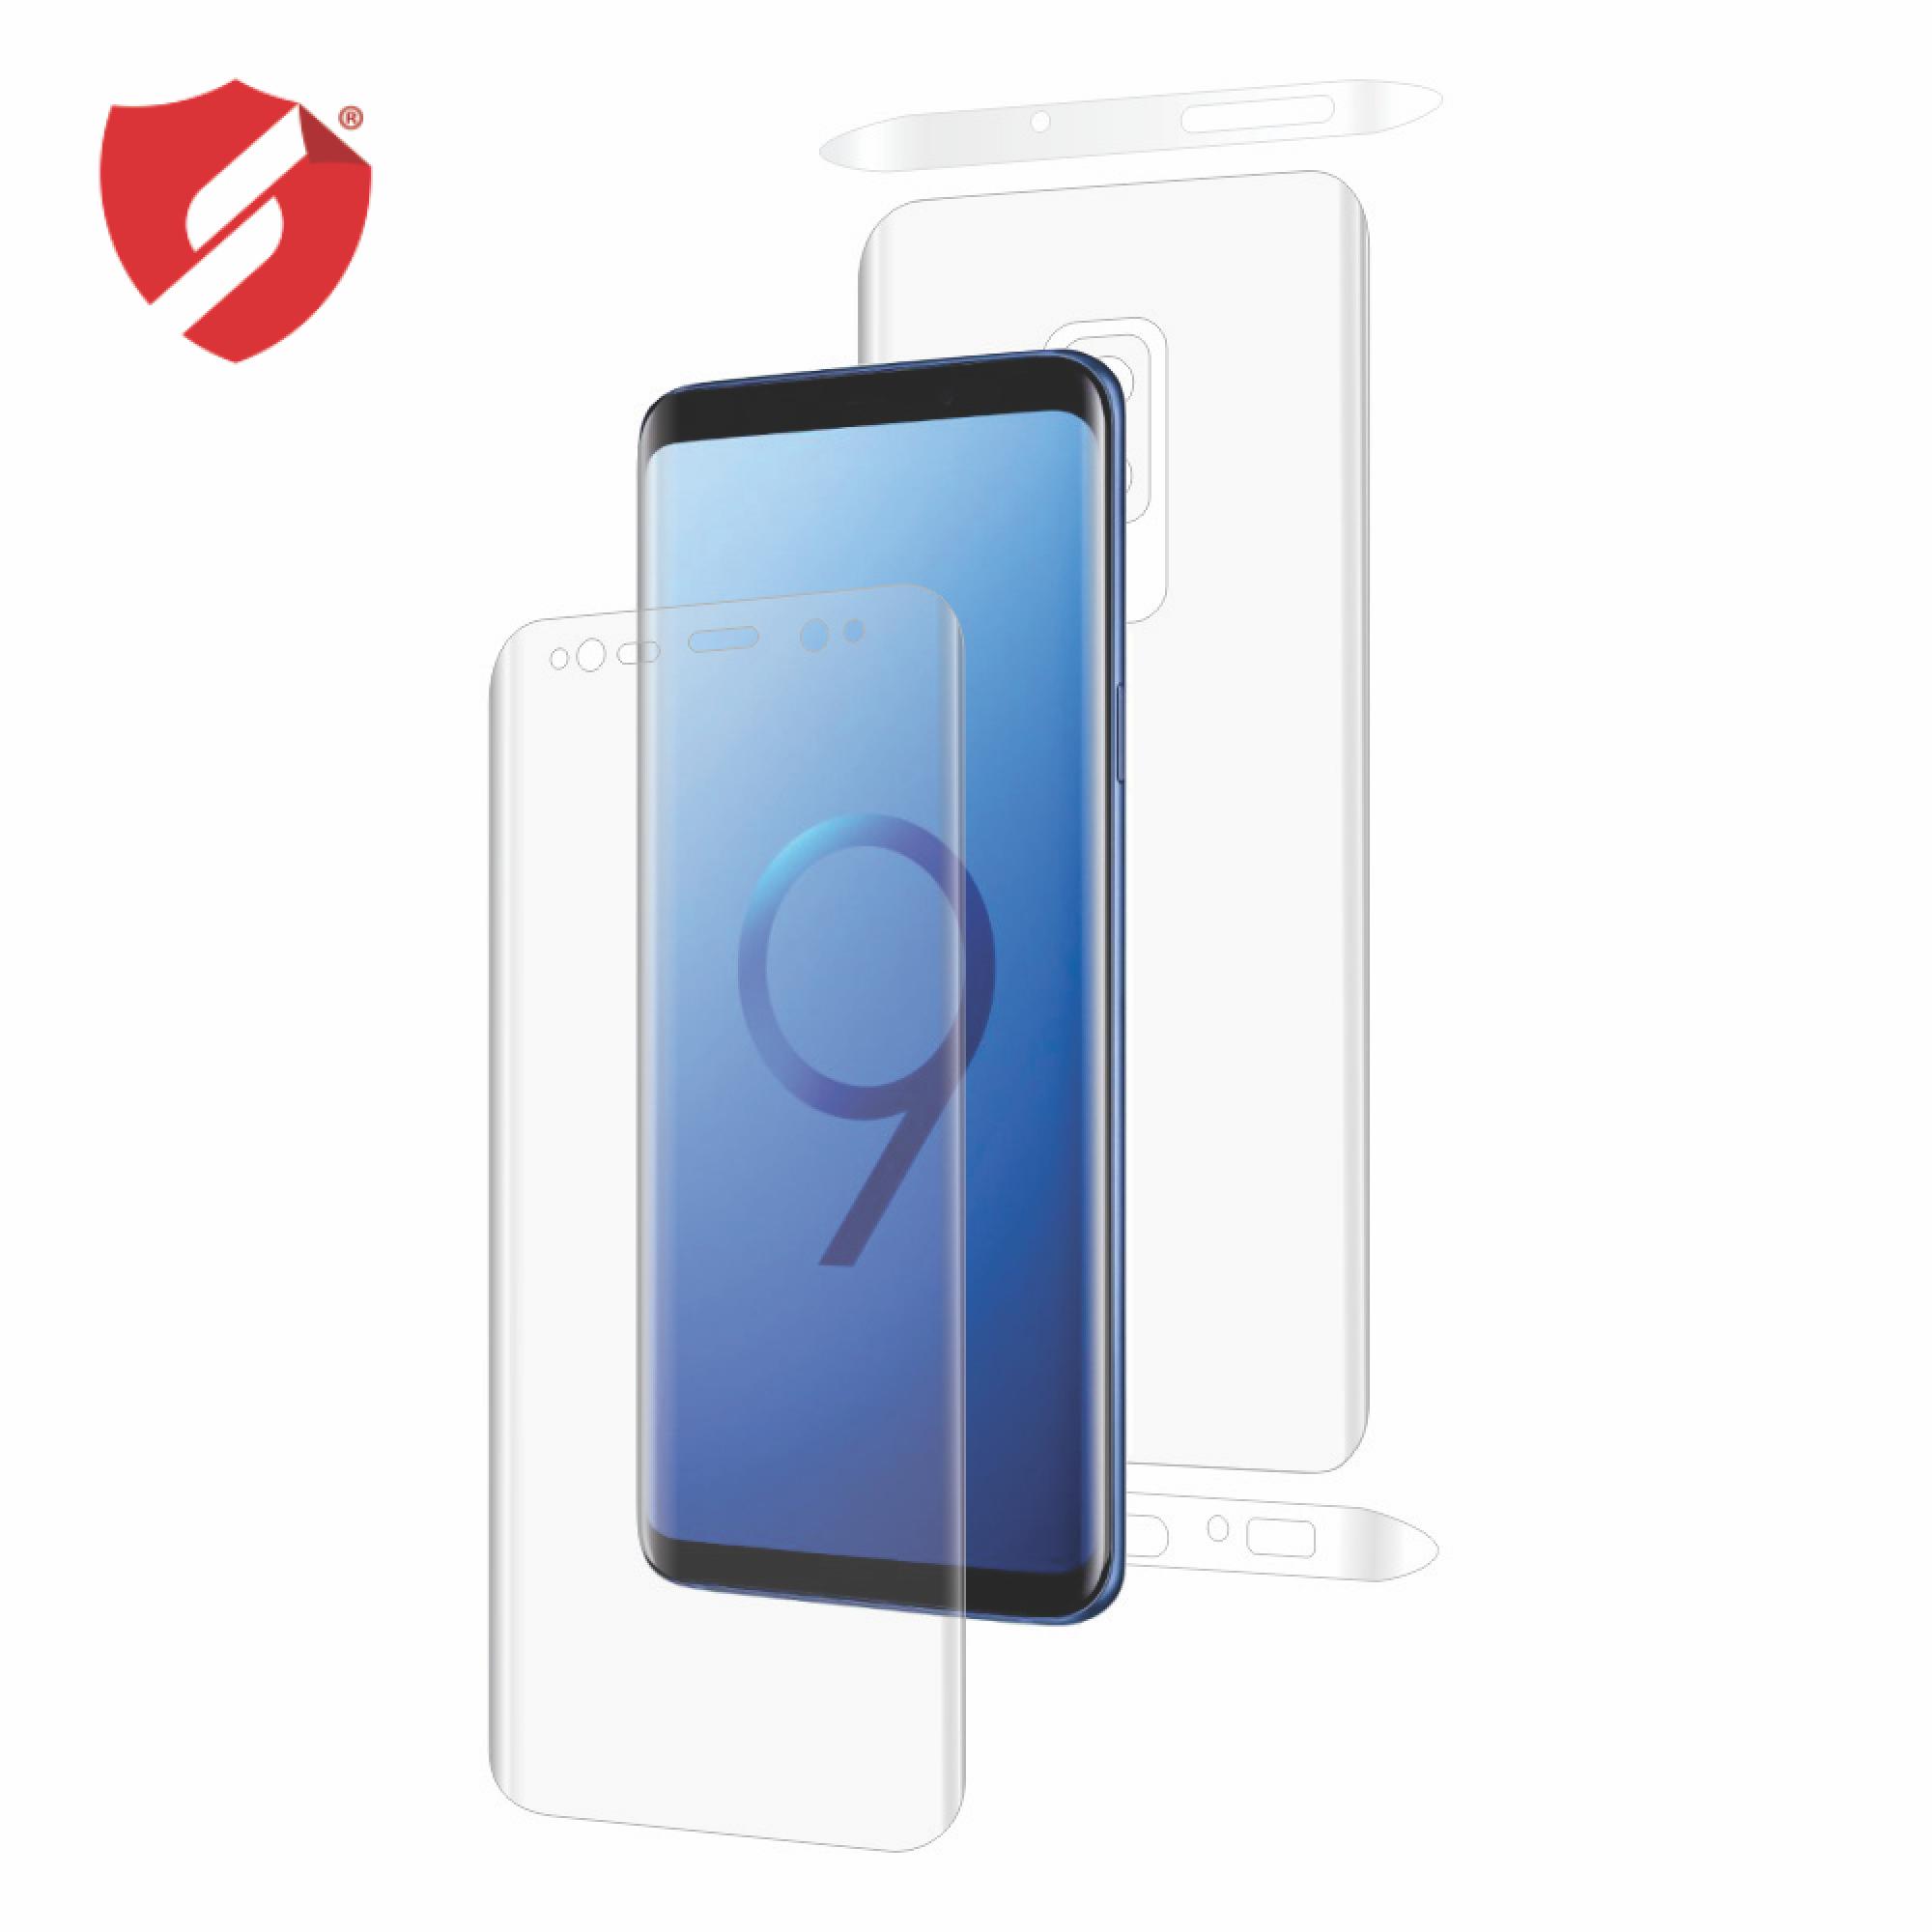 Folie de protectie Smart Protection Samsung Galaxy S9 Plus compatibila cu carcasa Ringke Slim - fullbody - display + spate + laterale imagine